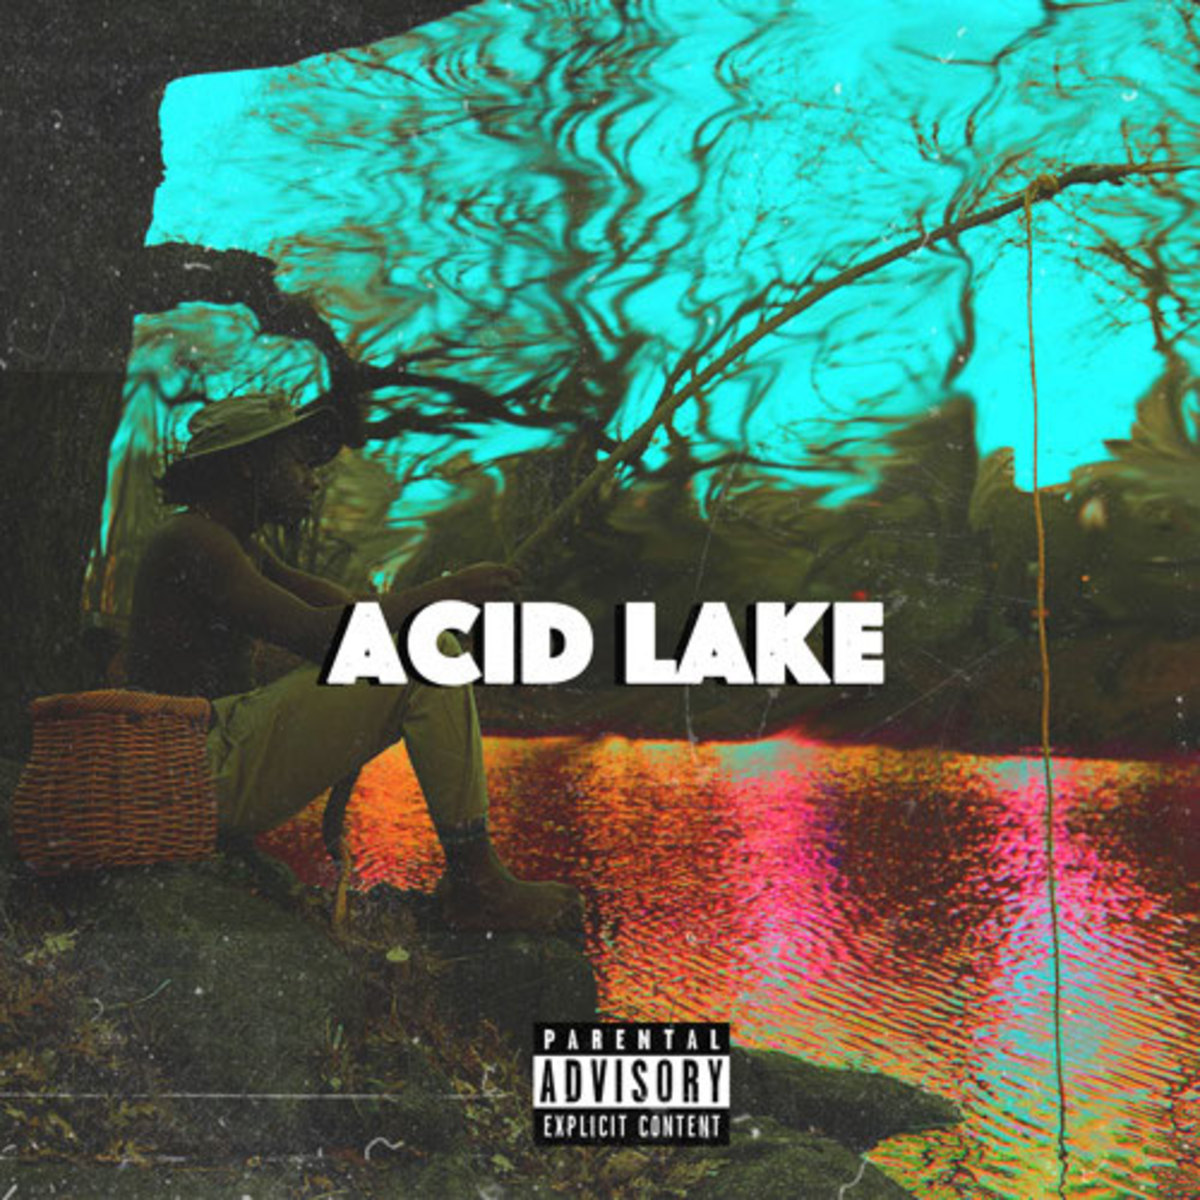 jay-bel-acid-lake.jpg